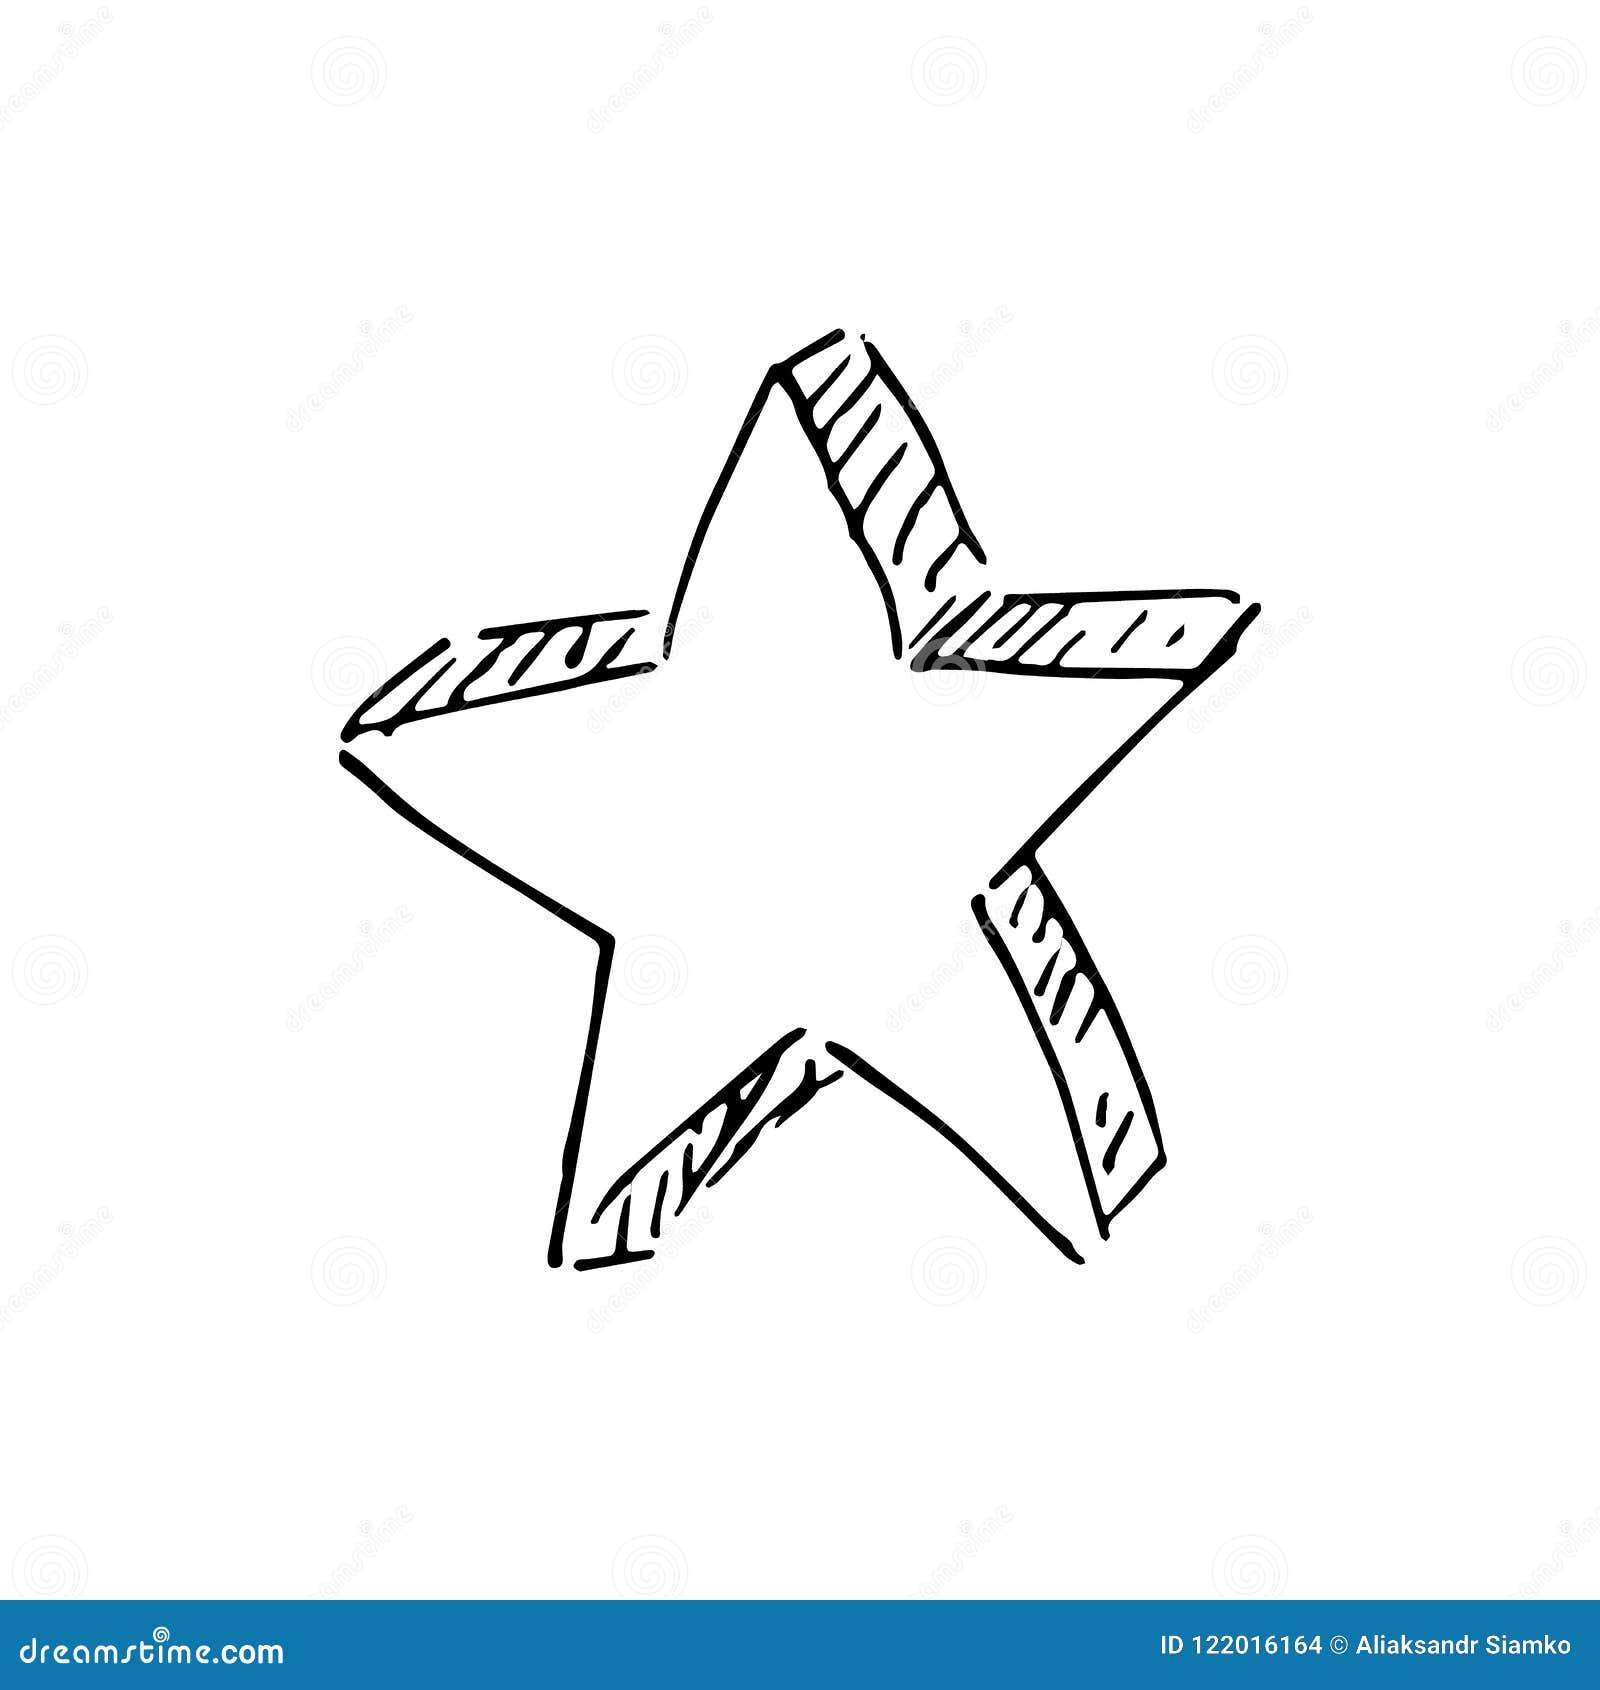 Handdrawn star doodle icon hand drawn black sketch sign